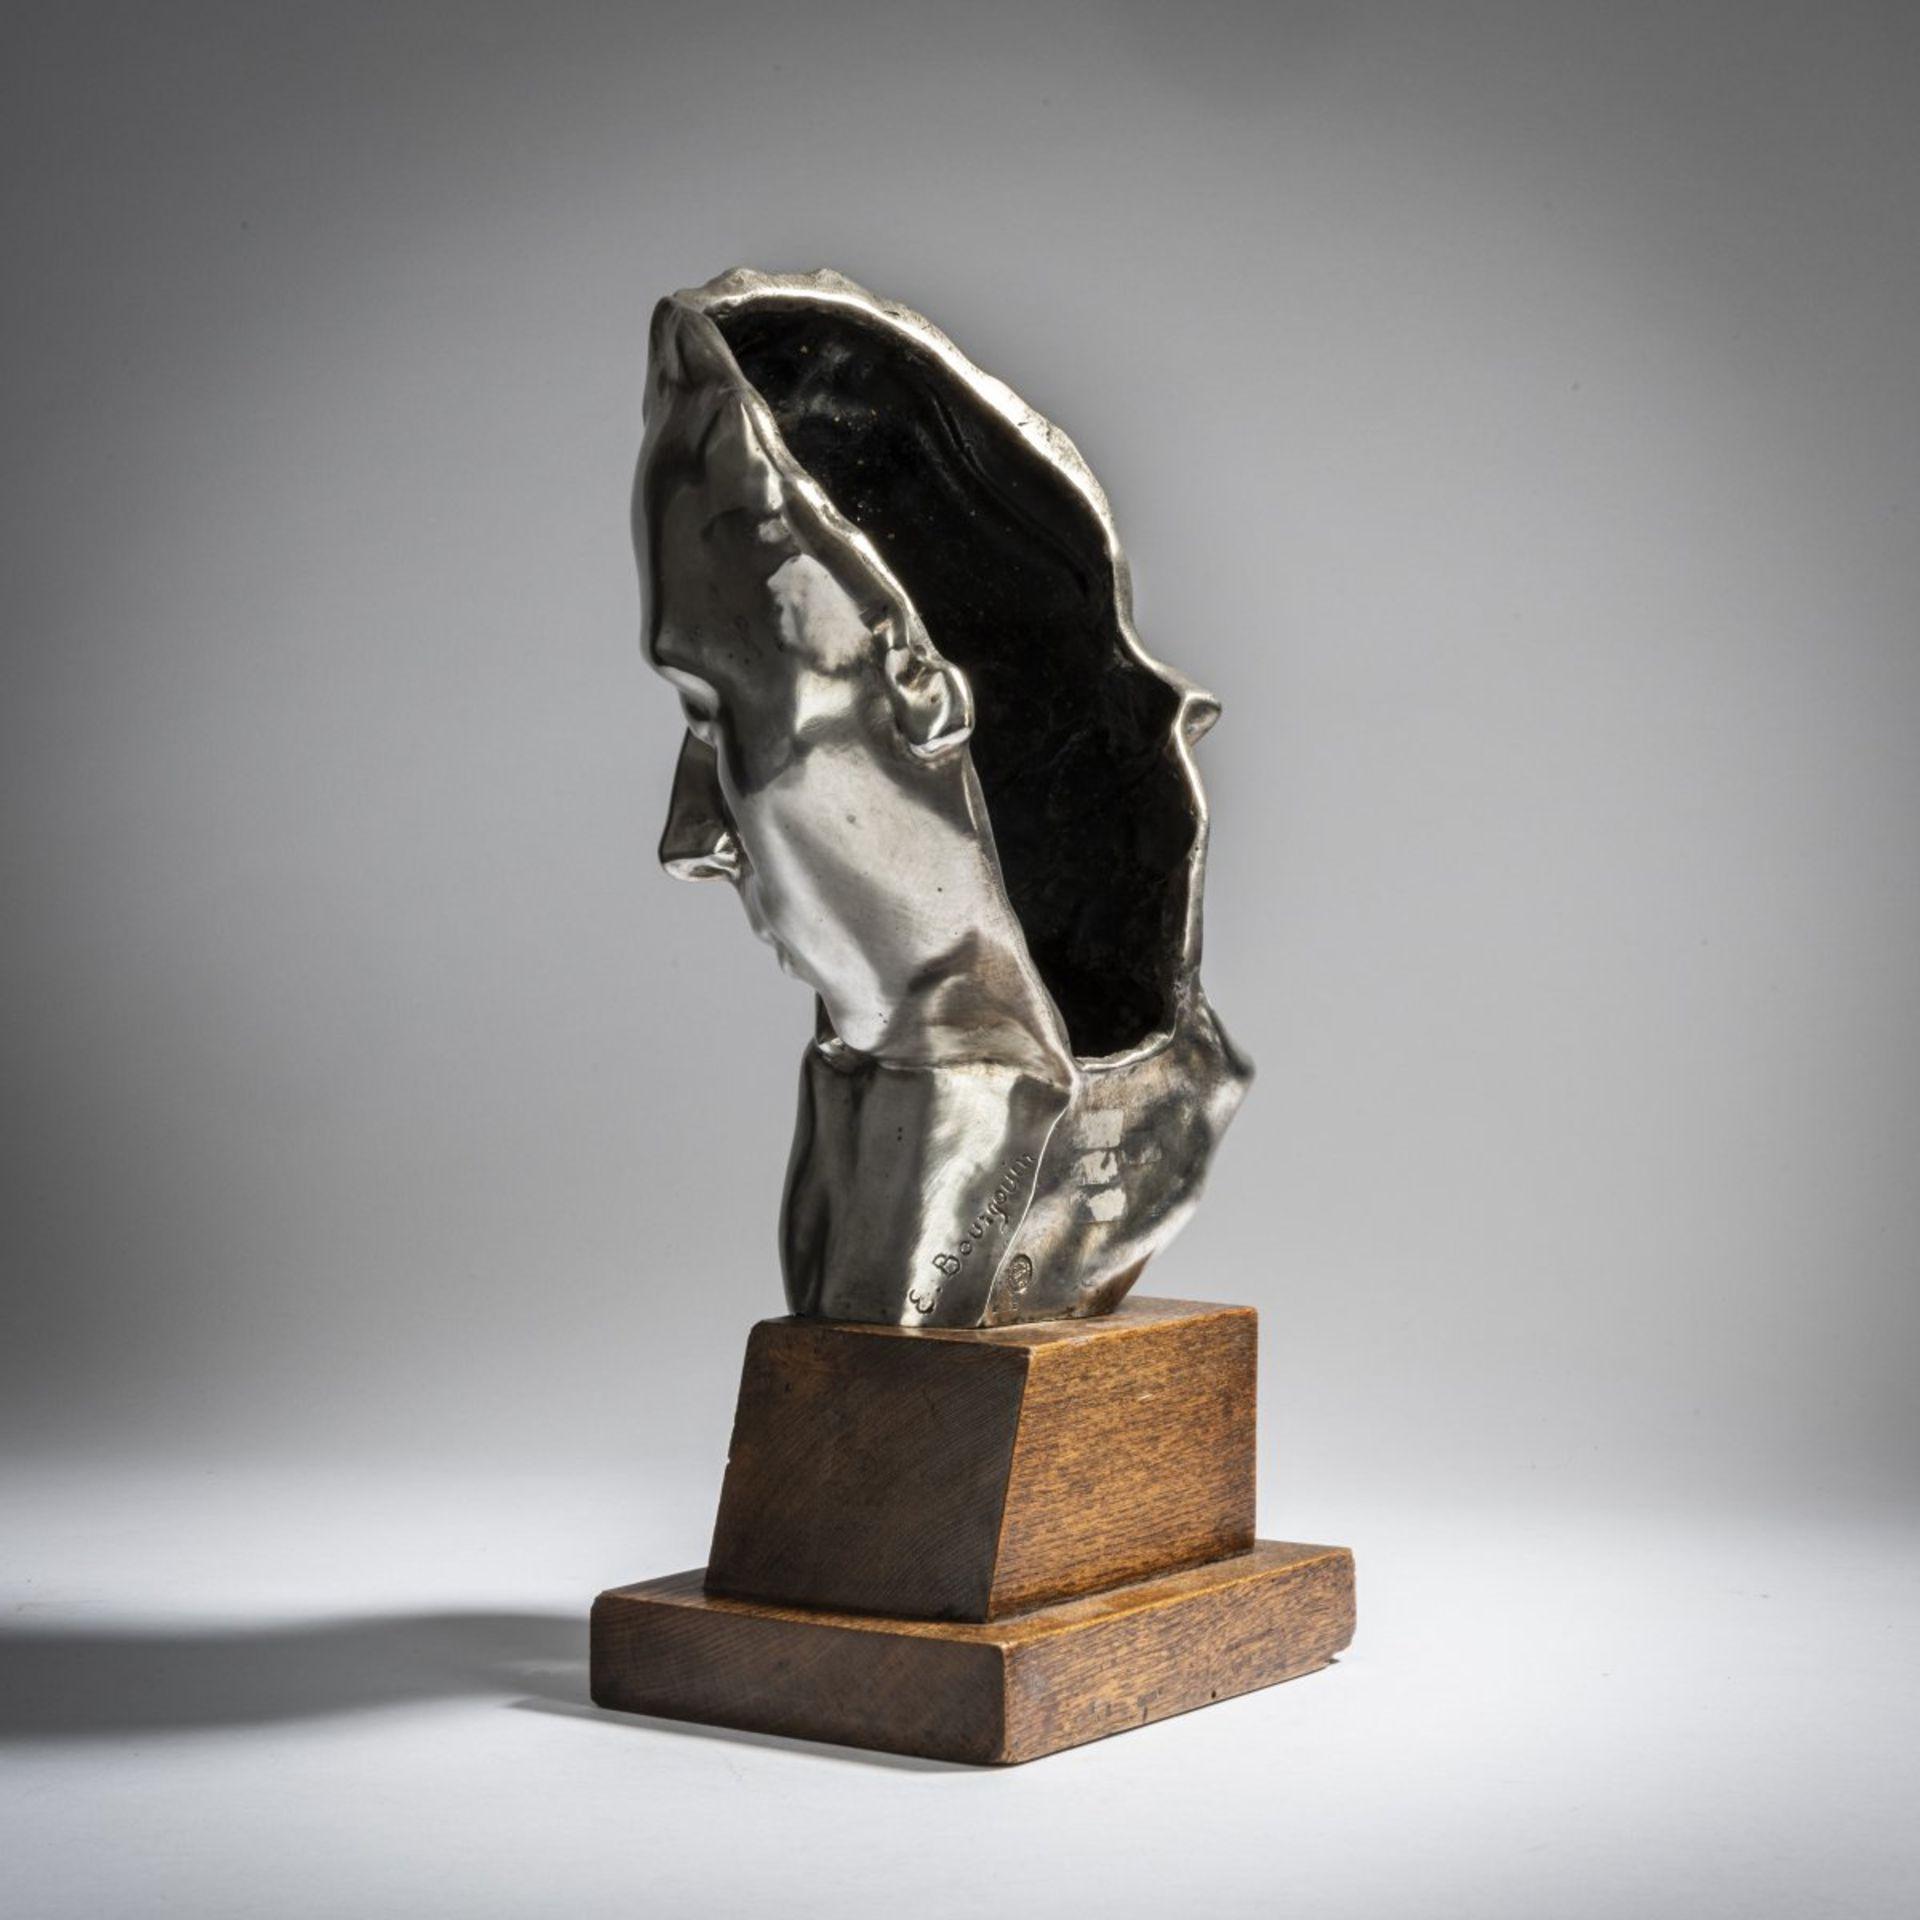 Eugène Bourgouin, 'La Prière', um 1930 - Bild 5 aus 8